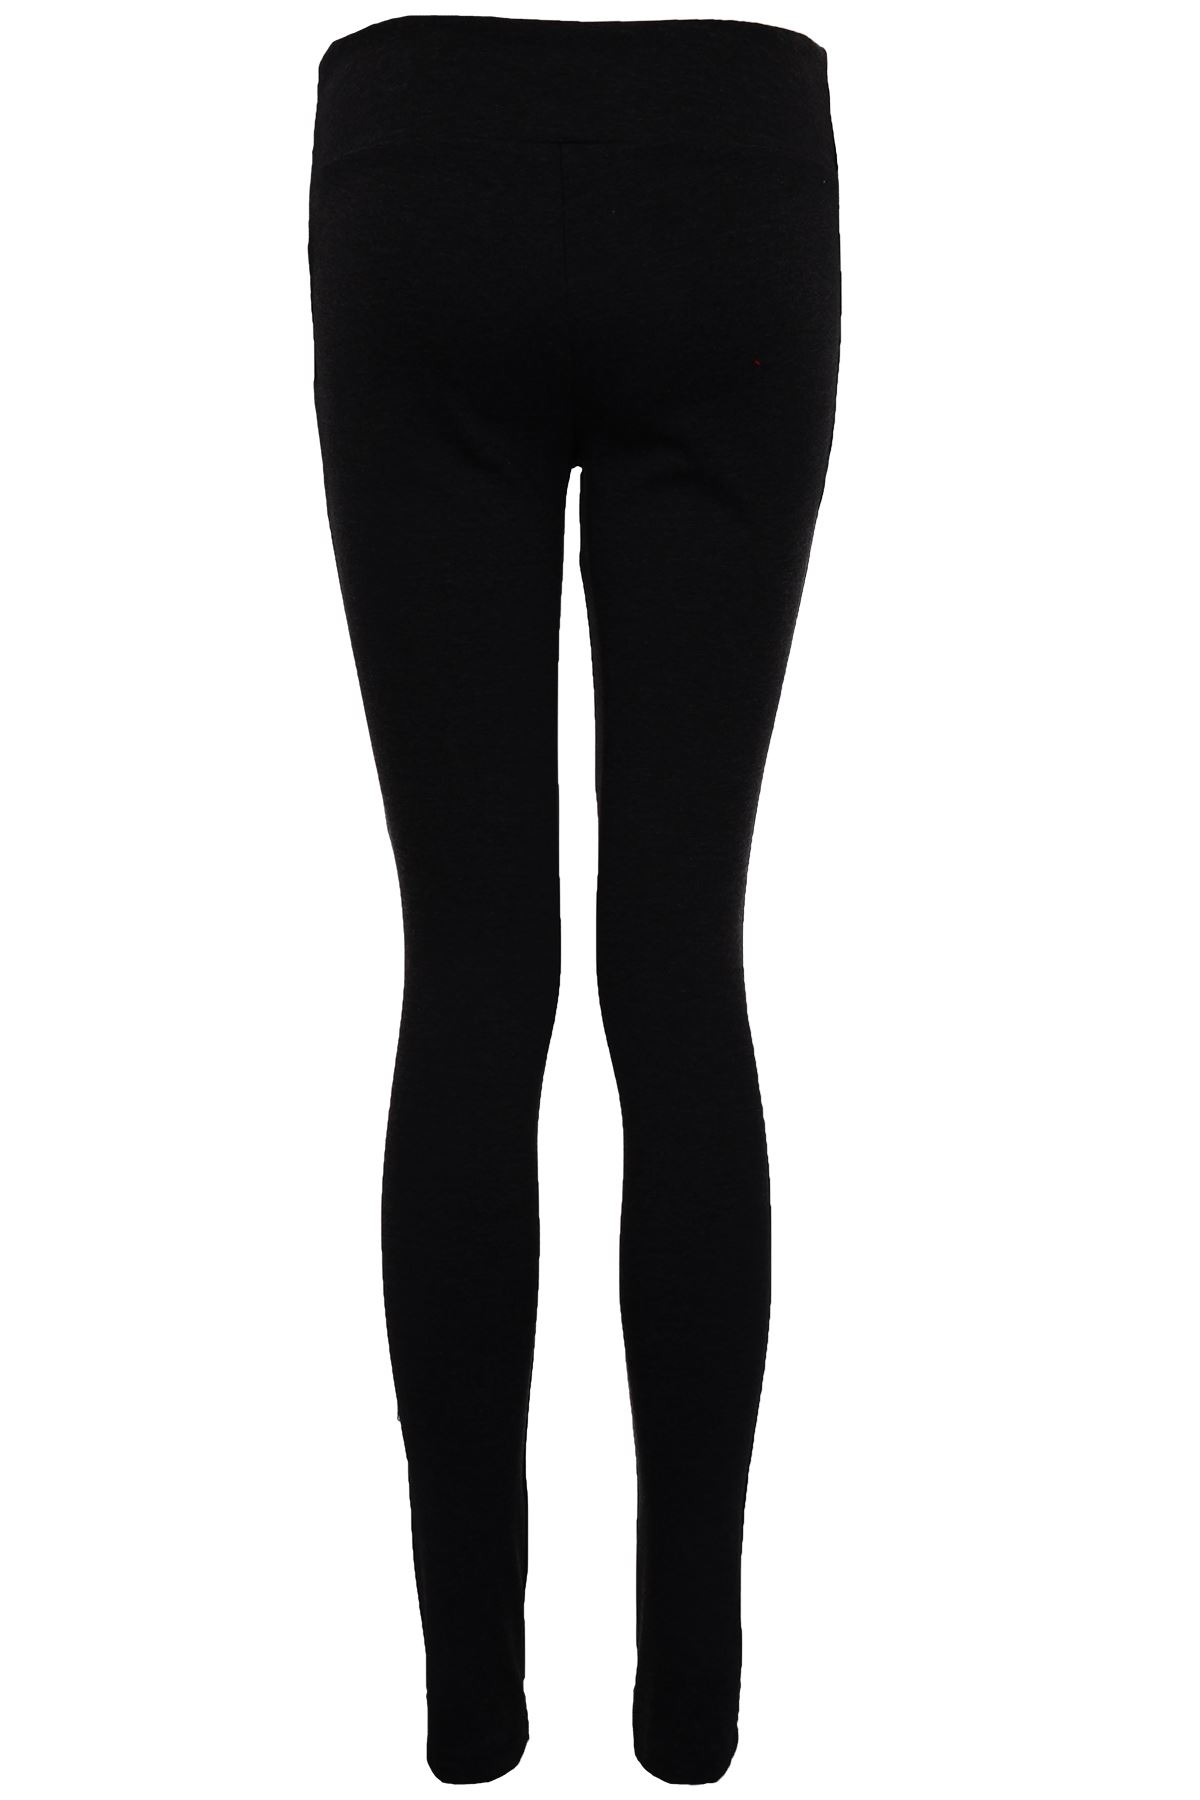 Ladies-Skinny-Fit-Gold-Zip-Pockets-Women-039- - Ladies Skinny Fit Gold Zip Pockets Women's Smart Office Jeggings